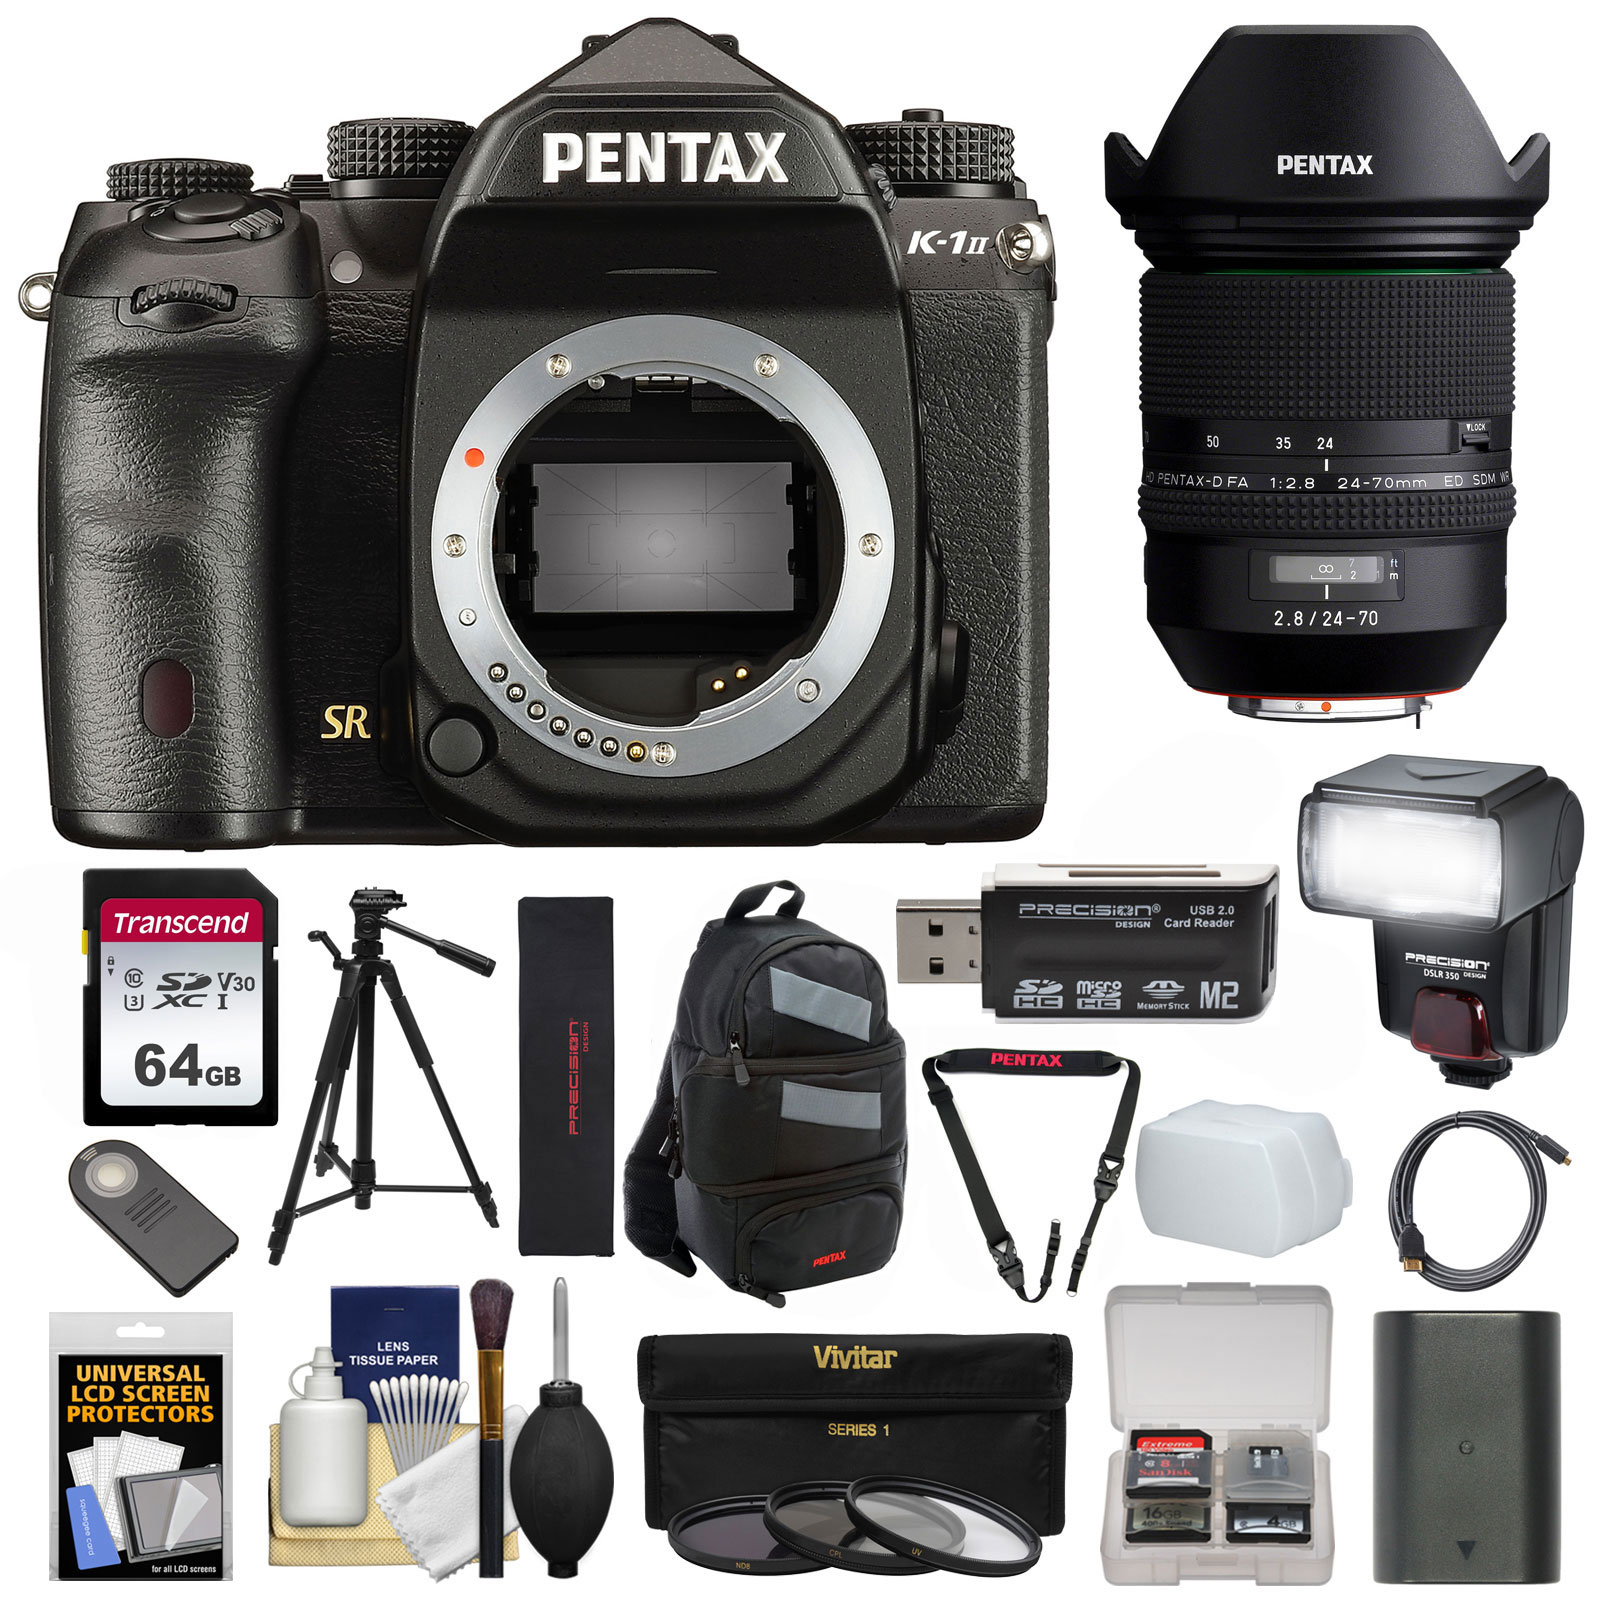 Pentax K-1 Mark II Full Frame Wi-Fi Digital SLR Camera Body with 24-70mm f 2.8 Lens + 64GB Card + Battery +... by Pentax